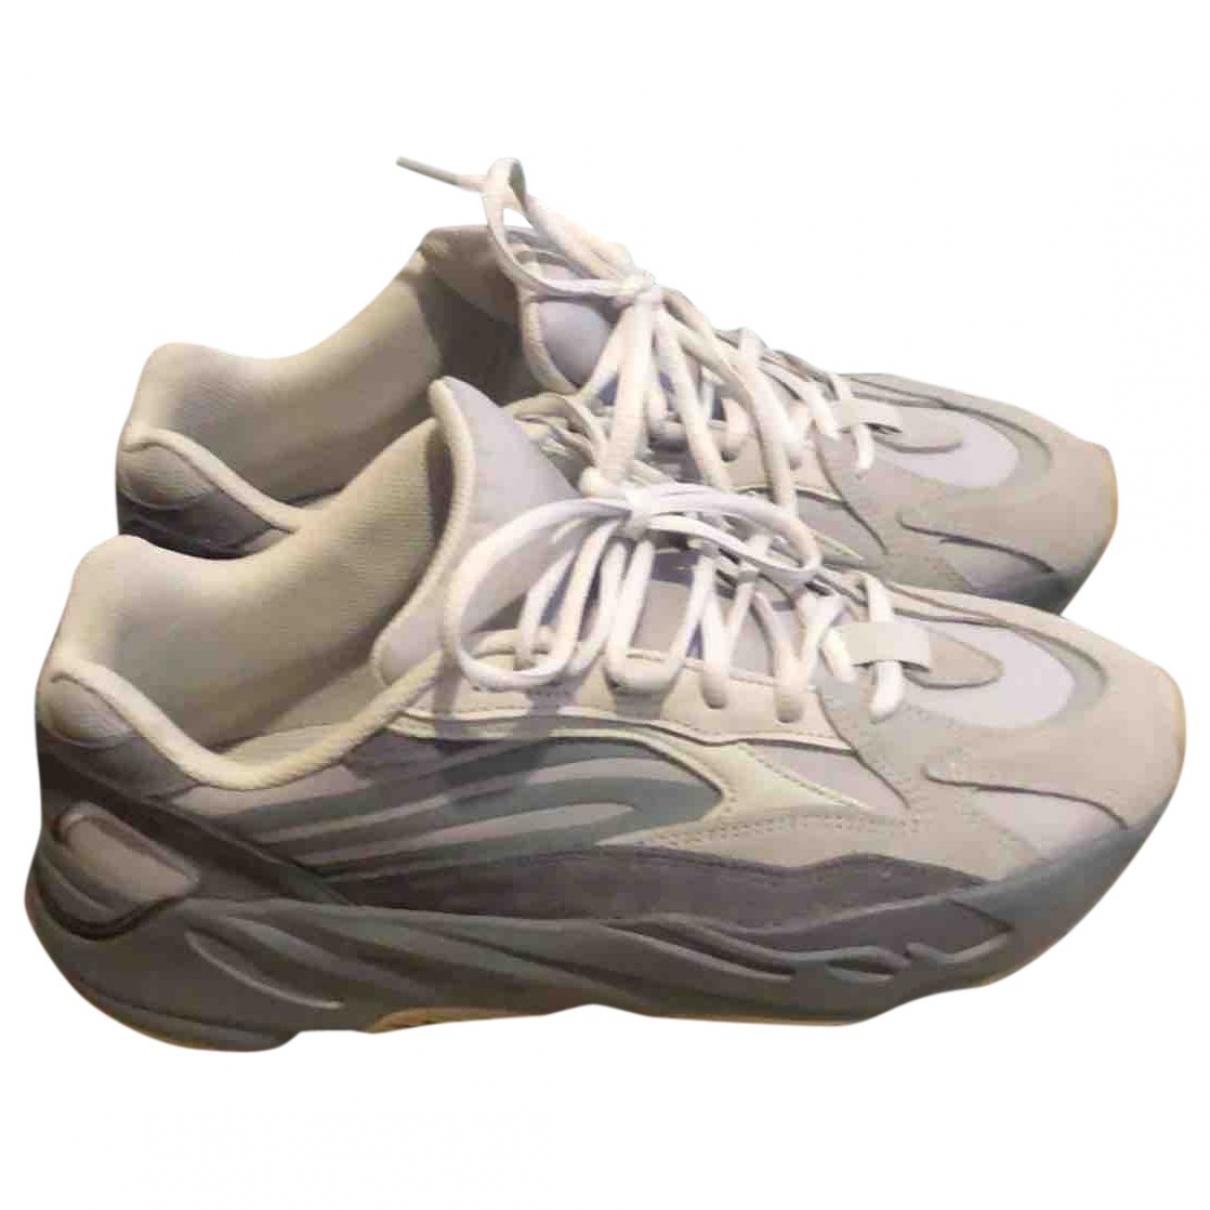 Yeezy X Adidas - Baskets Boost 700 V2 pour homme en toile - gris